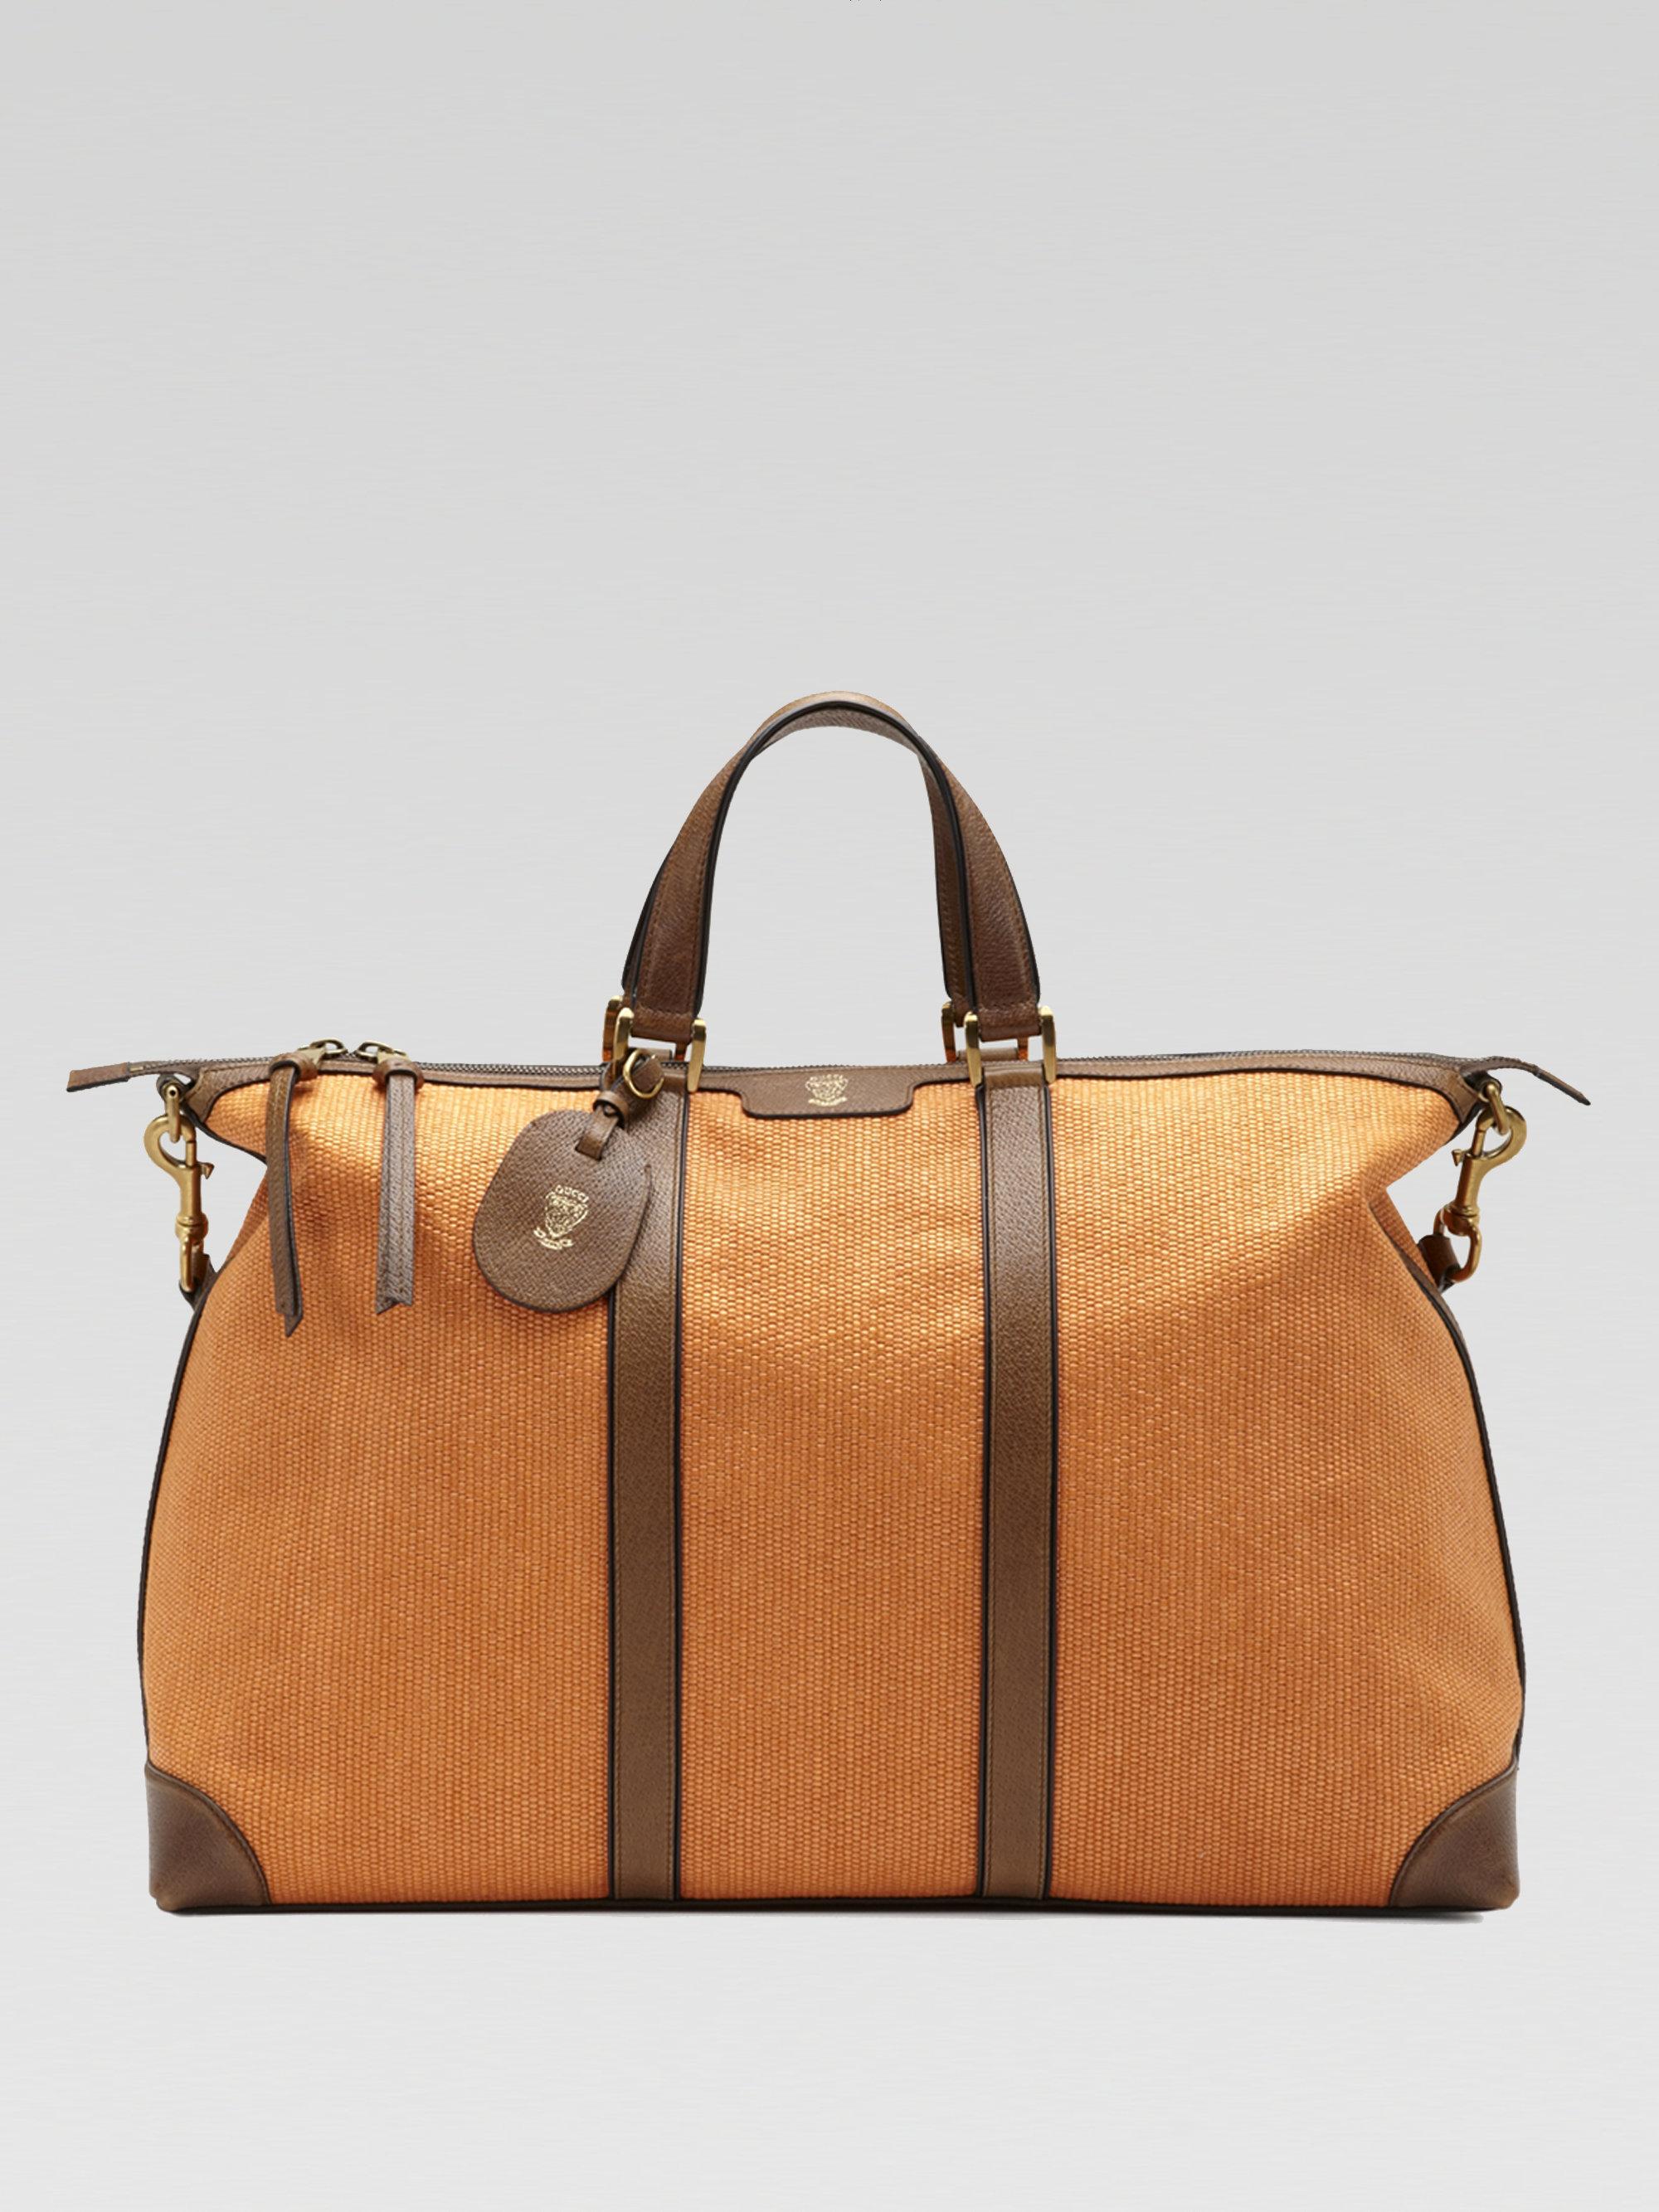 379a8b3a07af Tj Maxx Mens Leather Bags | Casper's & Runyon's Shamrocks | Nook